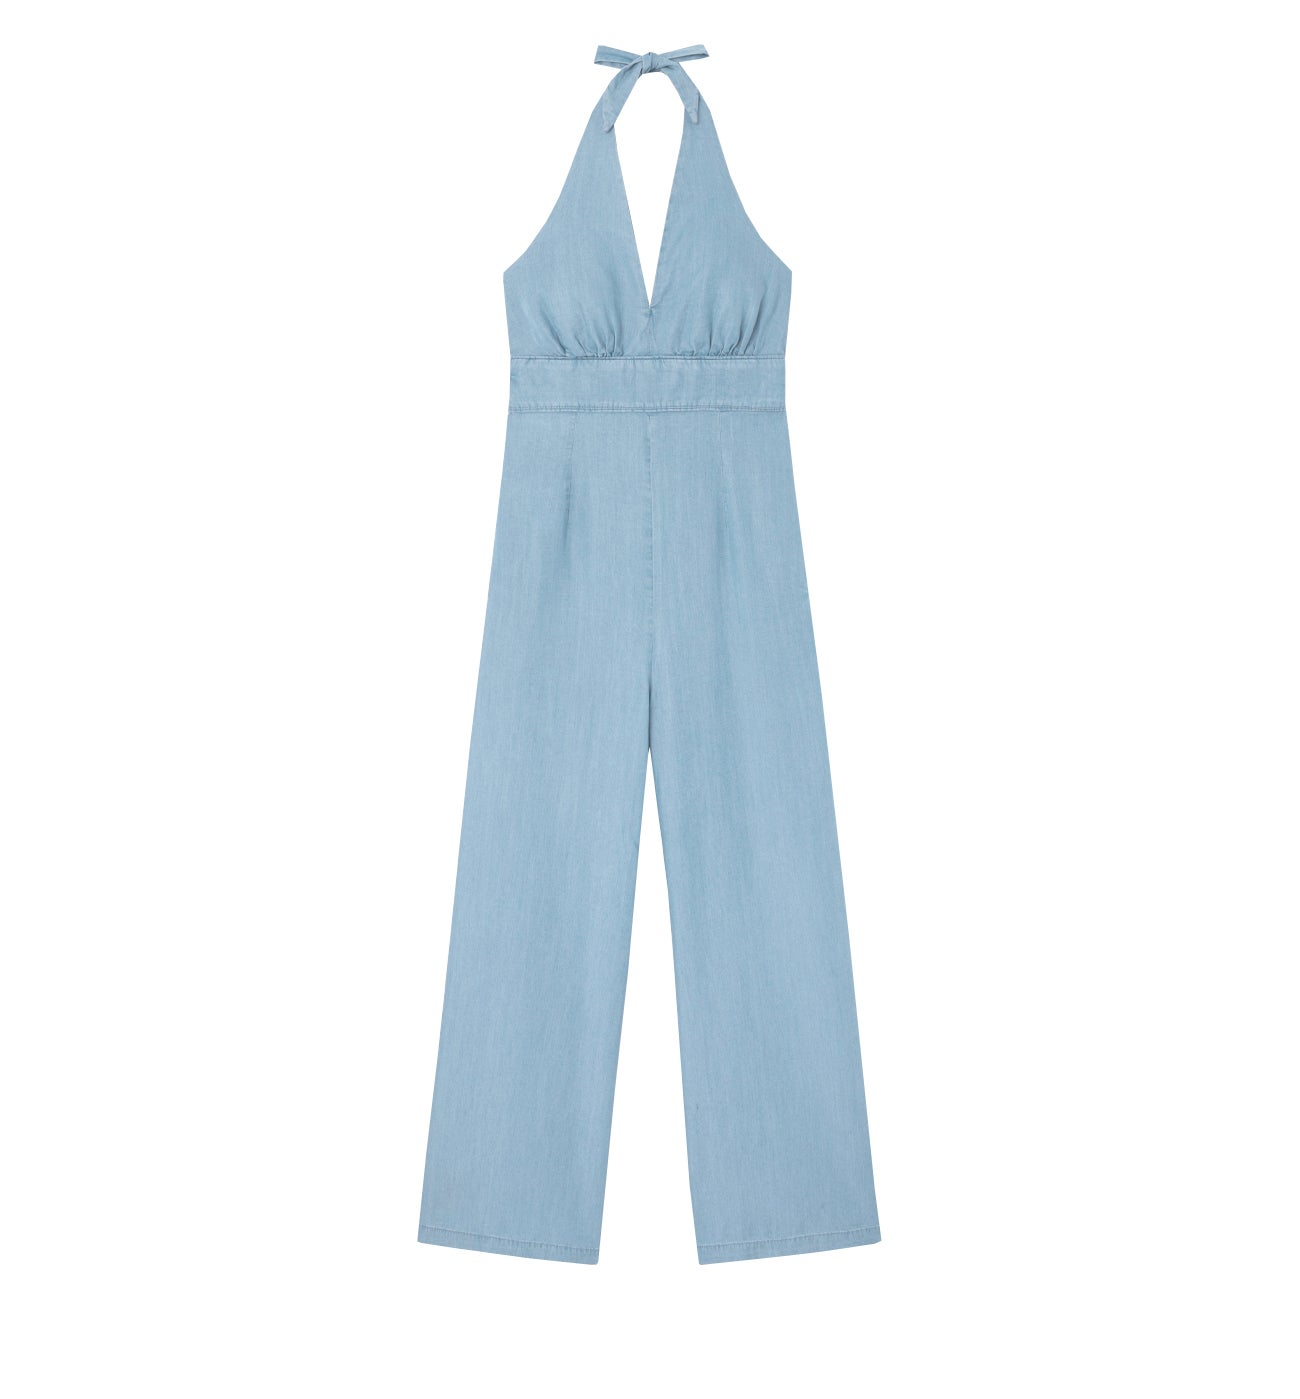 Combinaison-pantalon dos nu